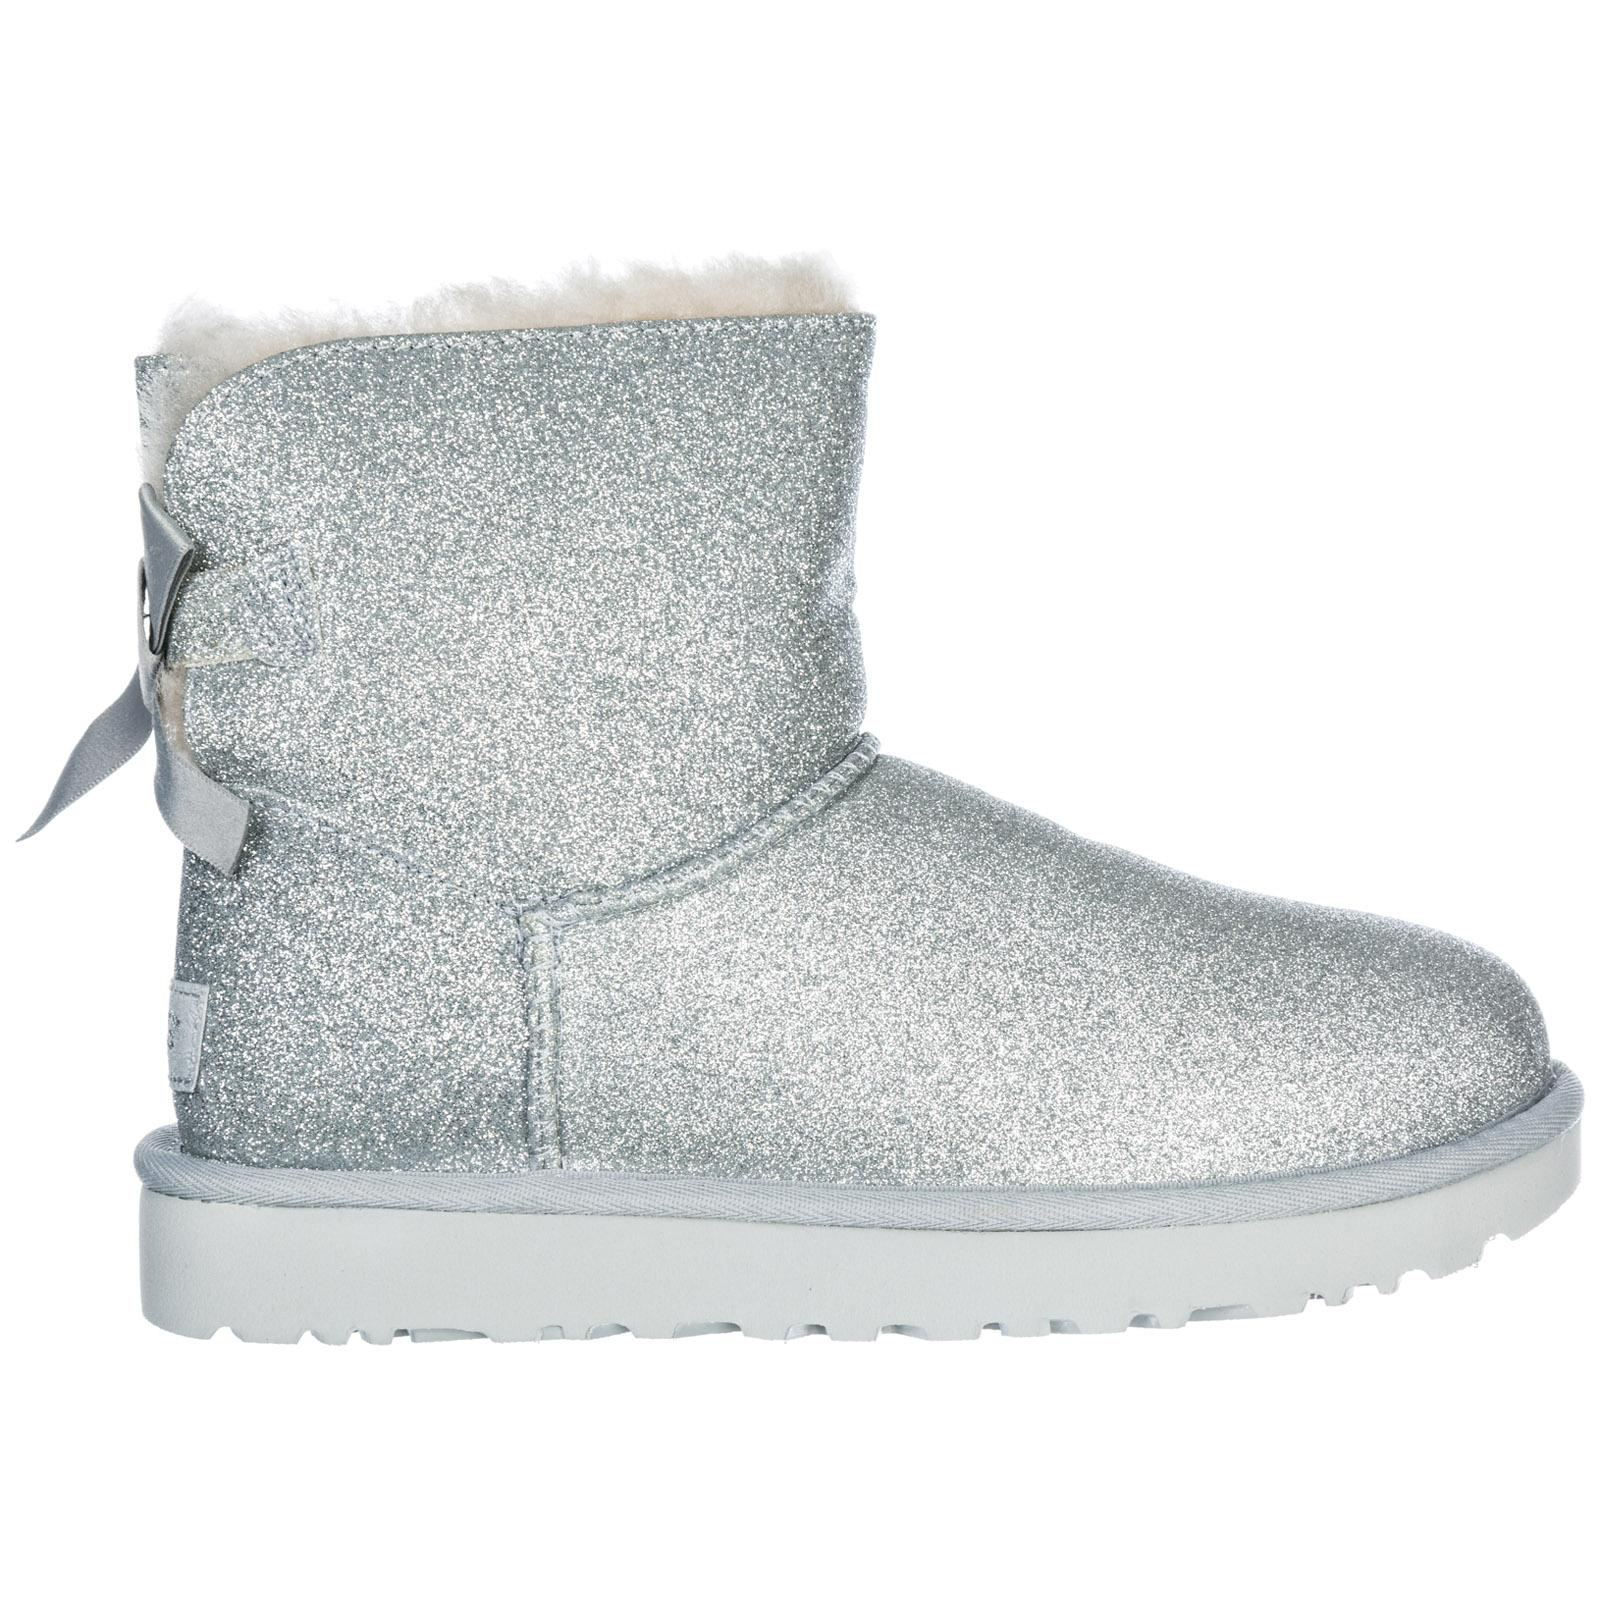 a099dd0e1fd Metallic Women's Boots Mini Bailey Bow Sparkle